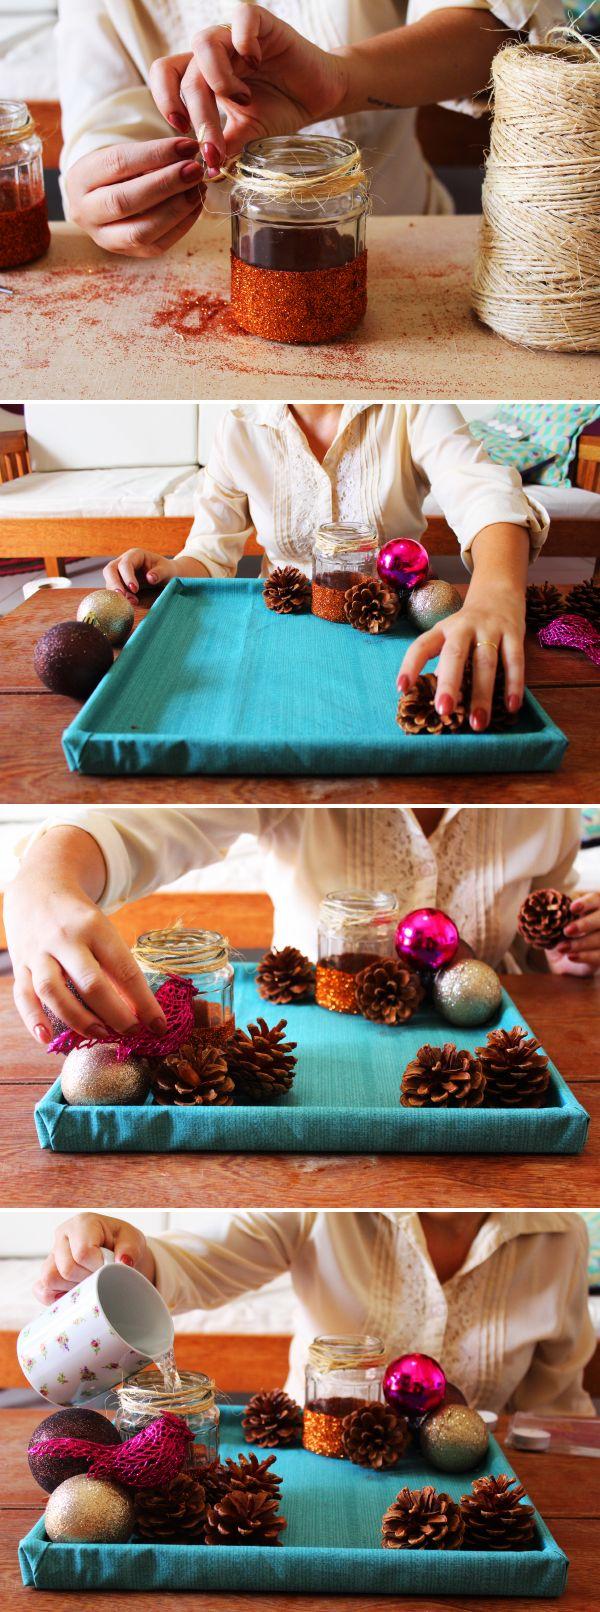 Potinhos de vidro reaproveitados no arranjo de natal: